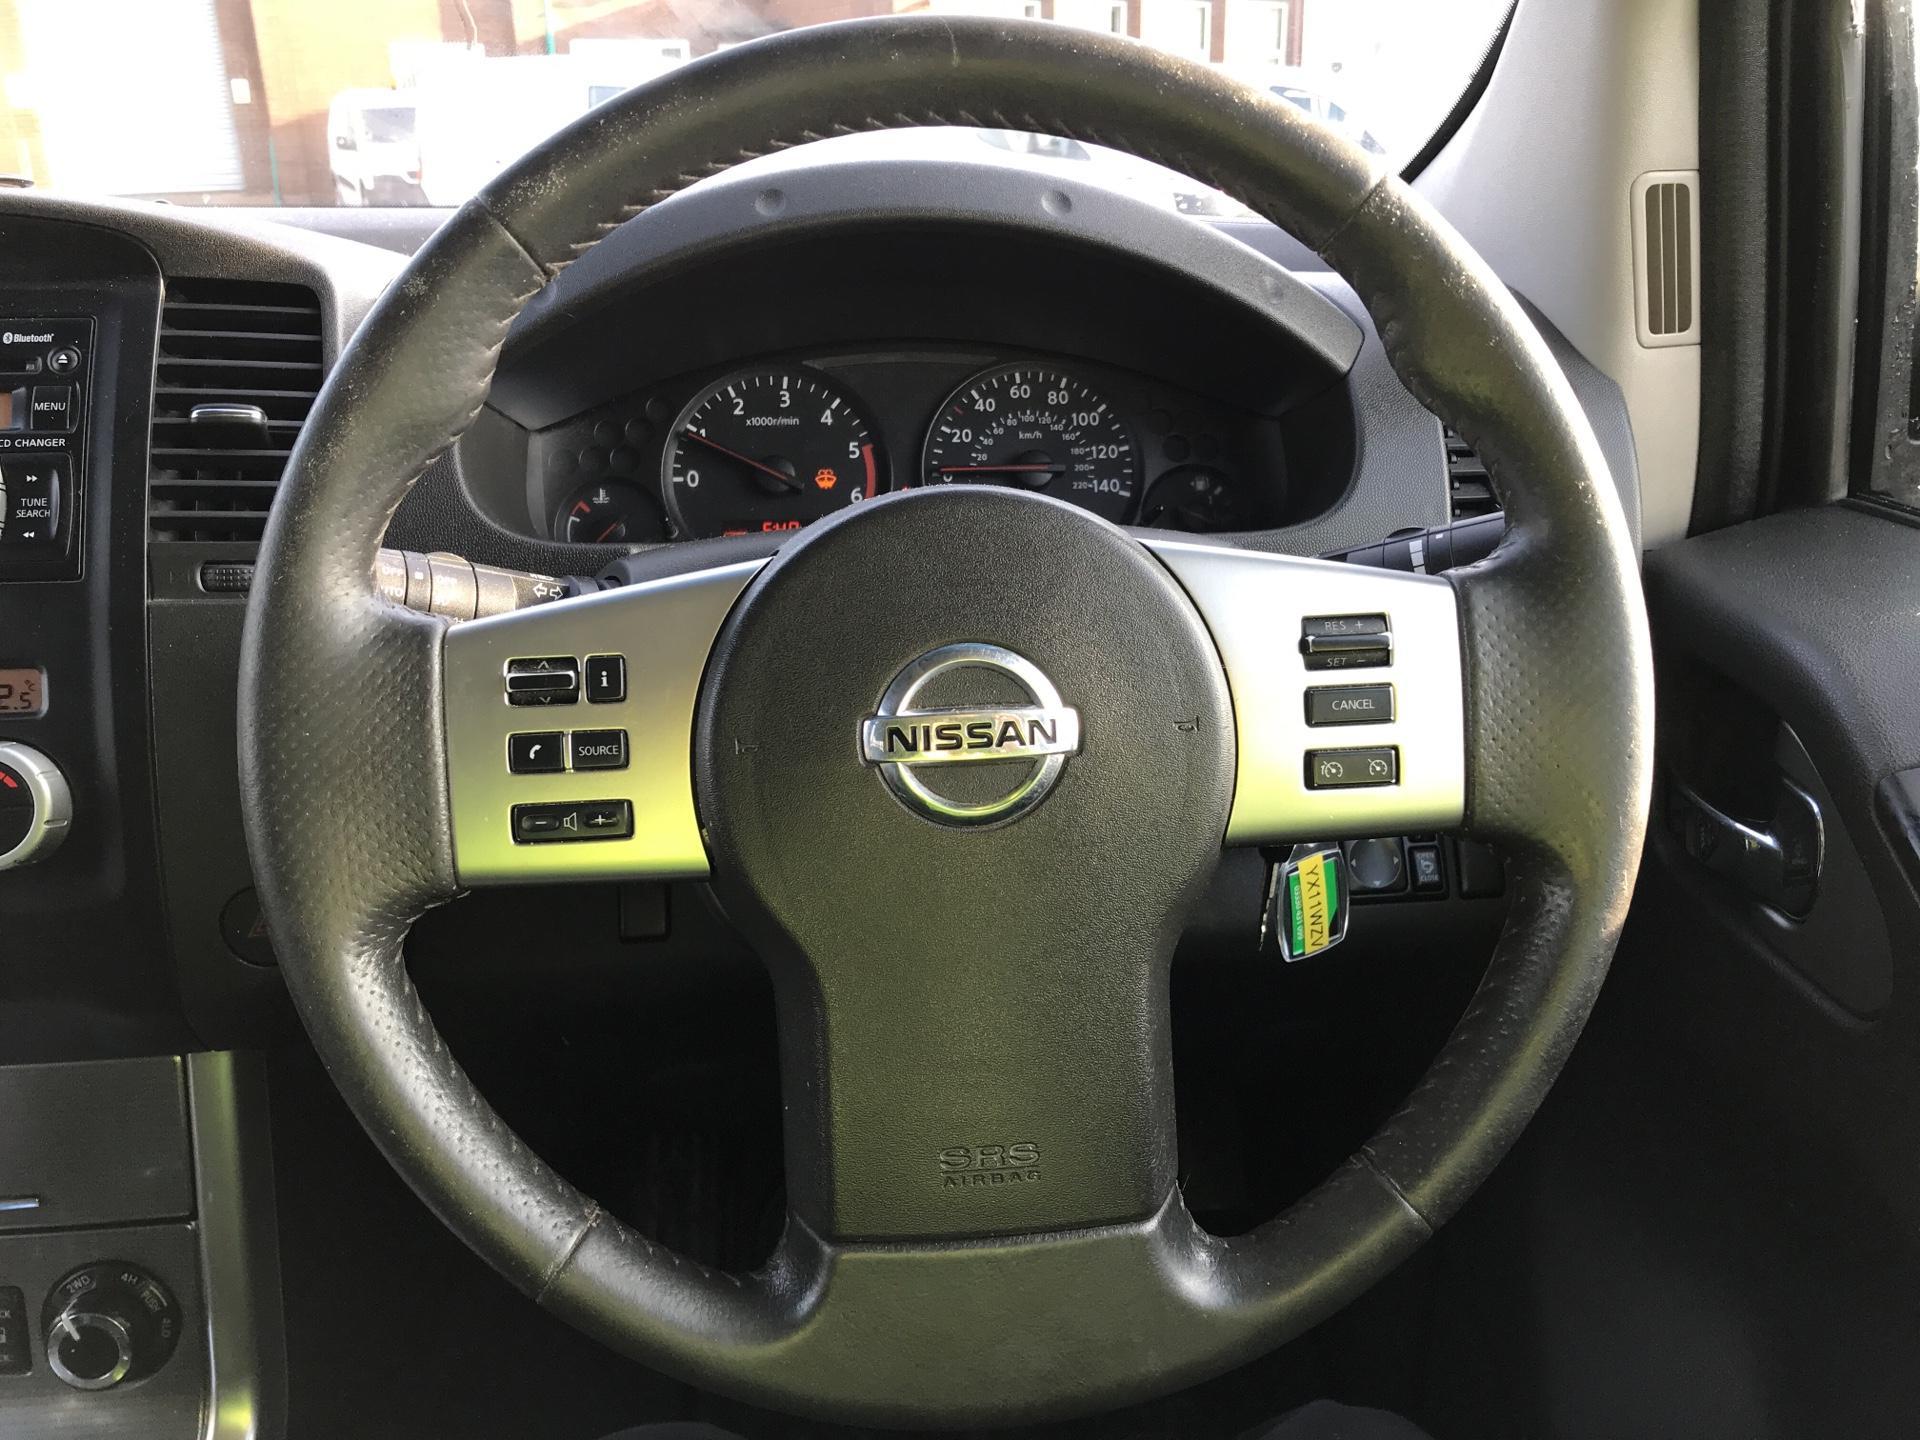 2011 Nissan Navara TEKNA 2.5 DCI 188 DOUBLE CAB AUTO EURO 4 (YX11WZV) Image 12